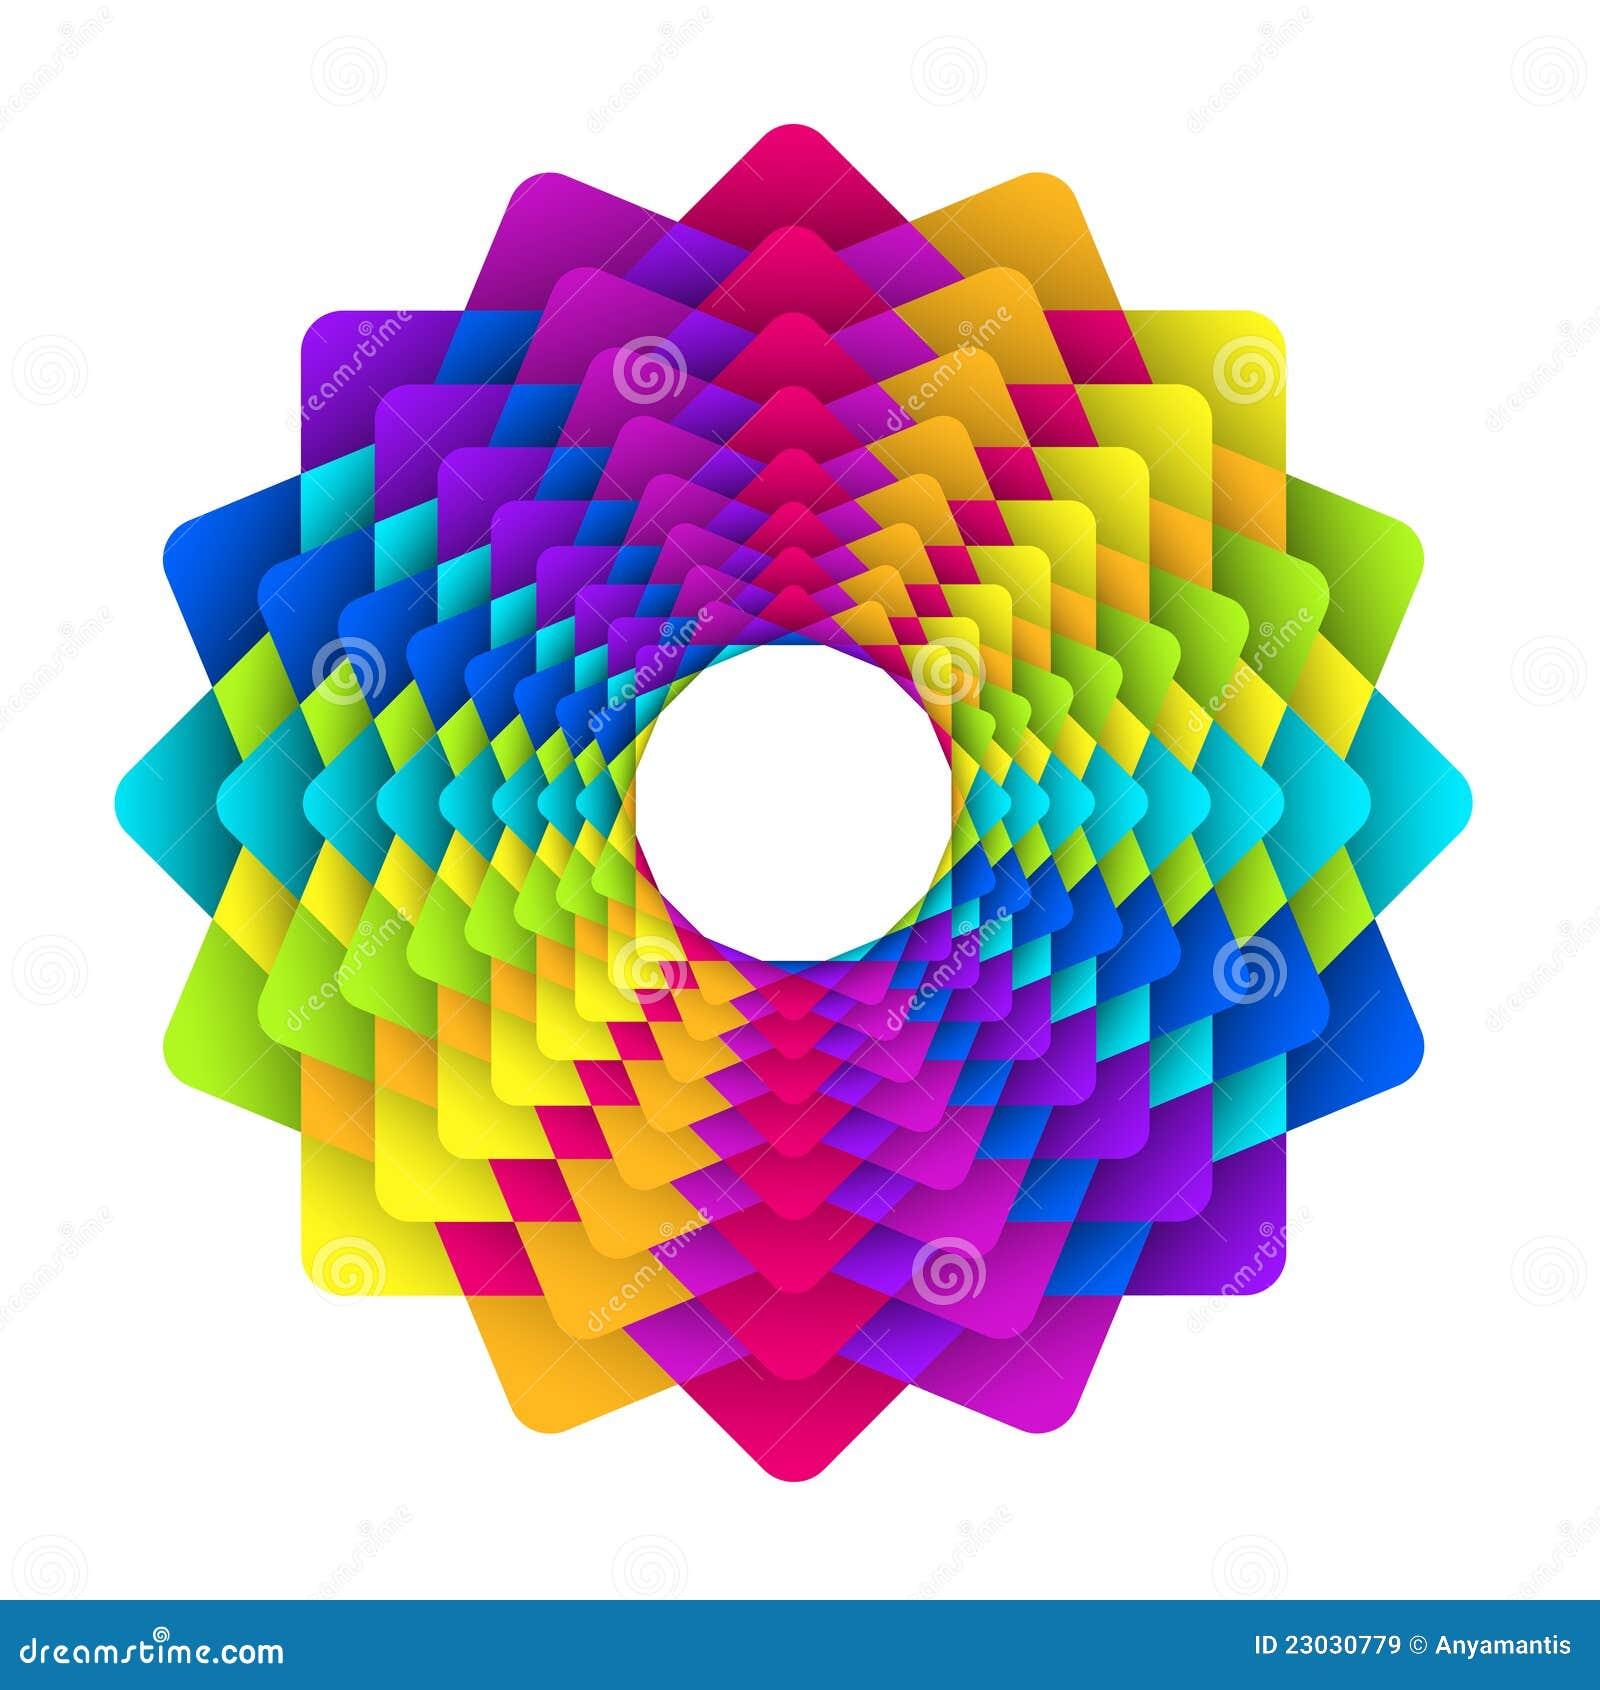 Rainbow Flower Logo Royalty Free Stock Images